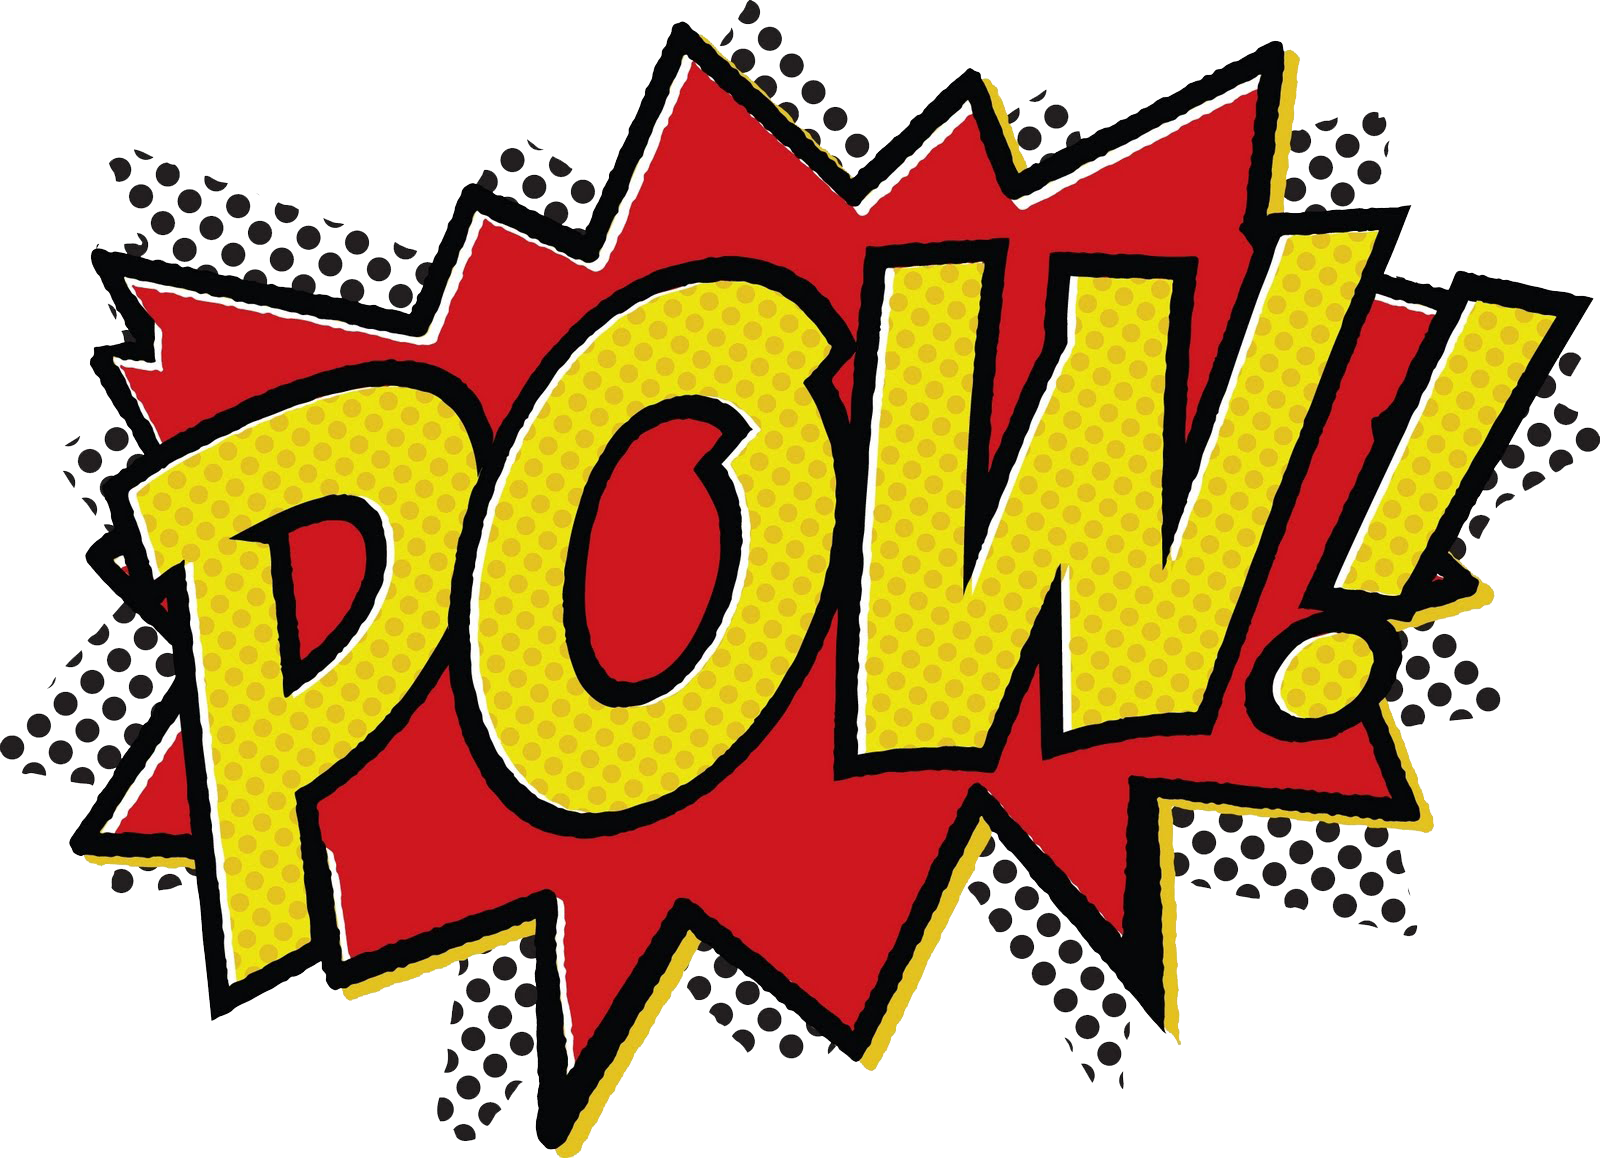 Super Hero Words Clip Art C1f